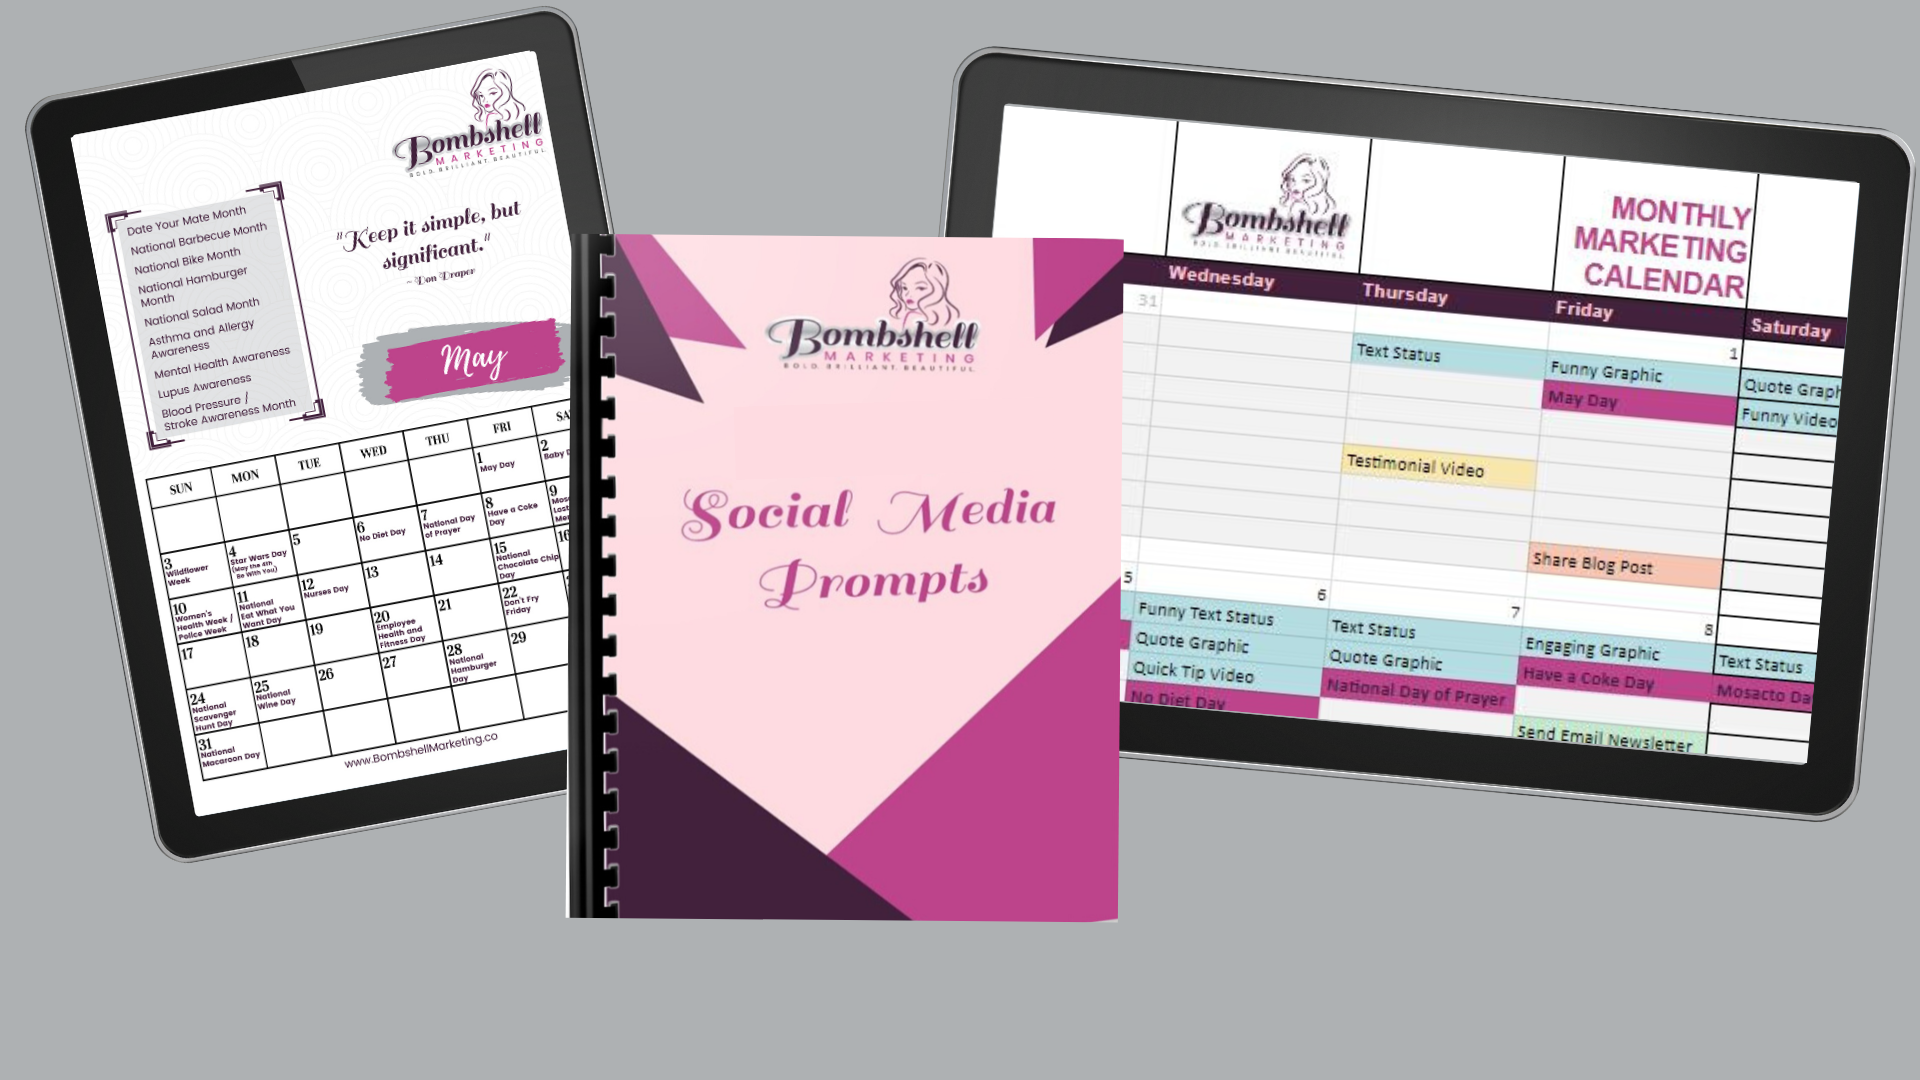 Savvy Social Media Prompts & Planning